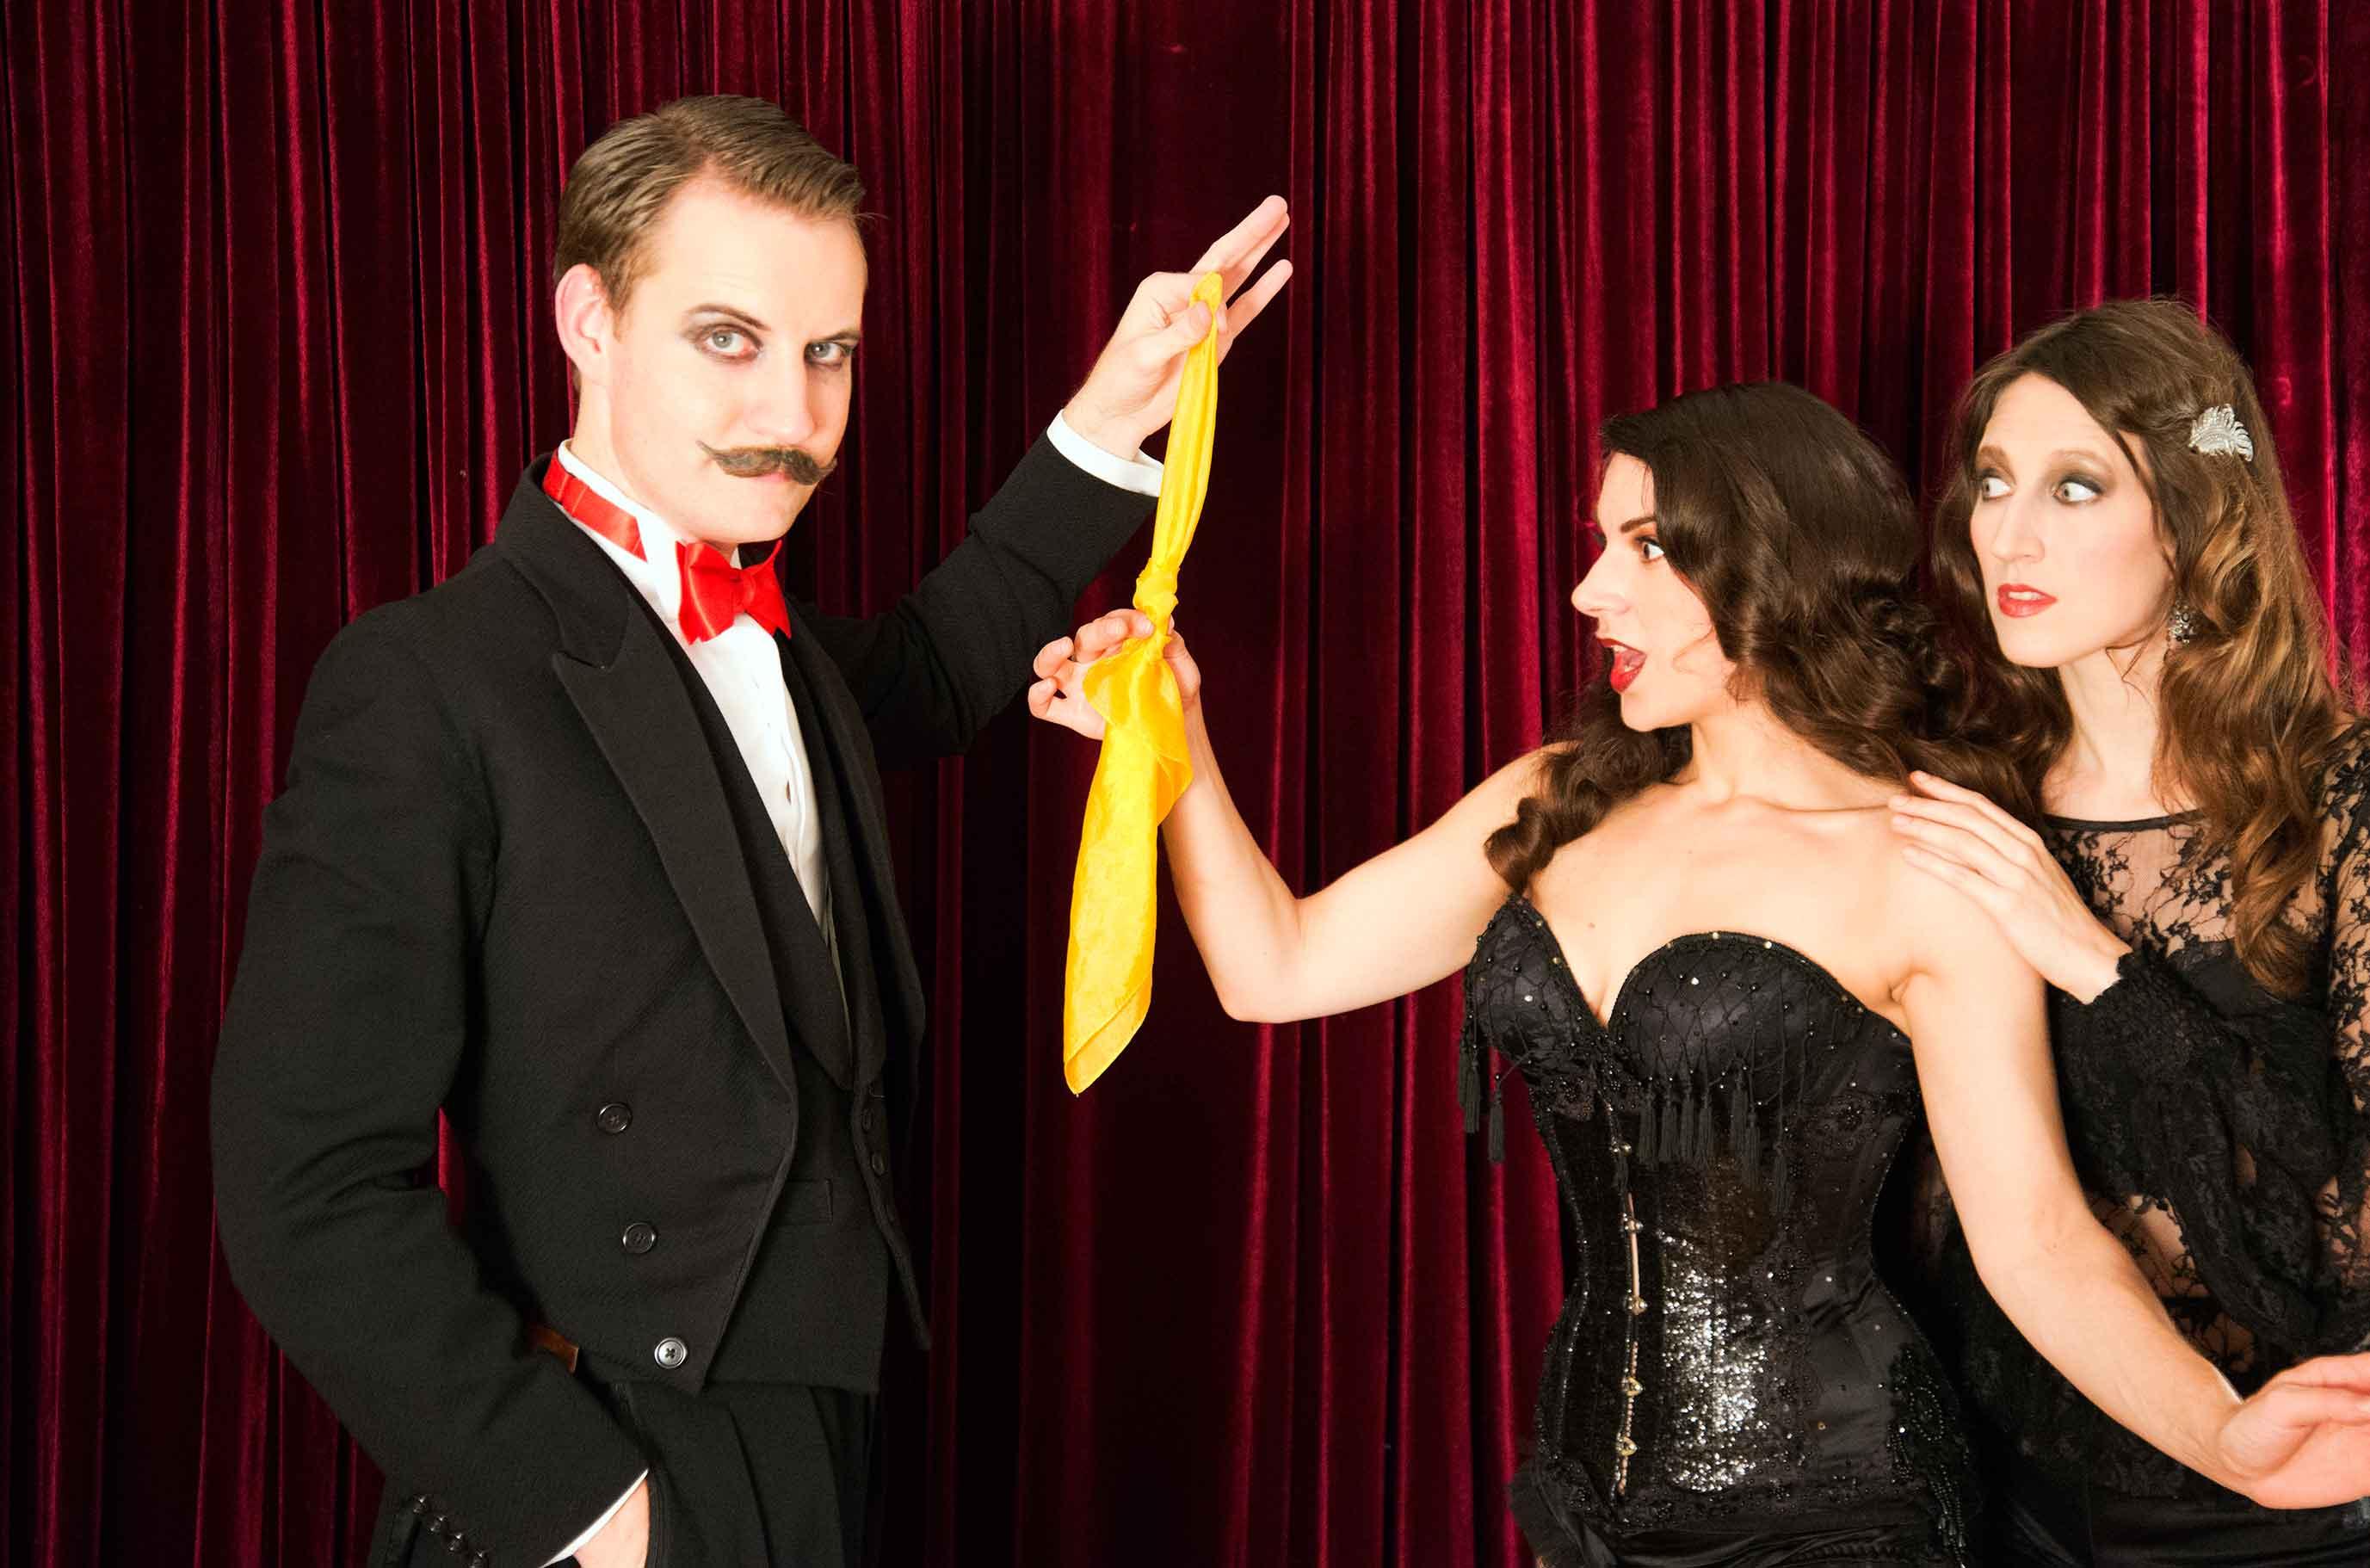 magic, walkabout, comedy, assistants, ladies, magician